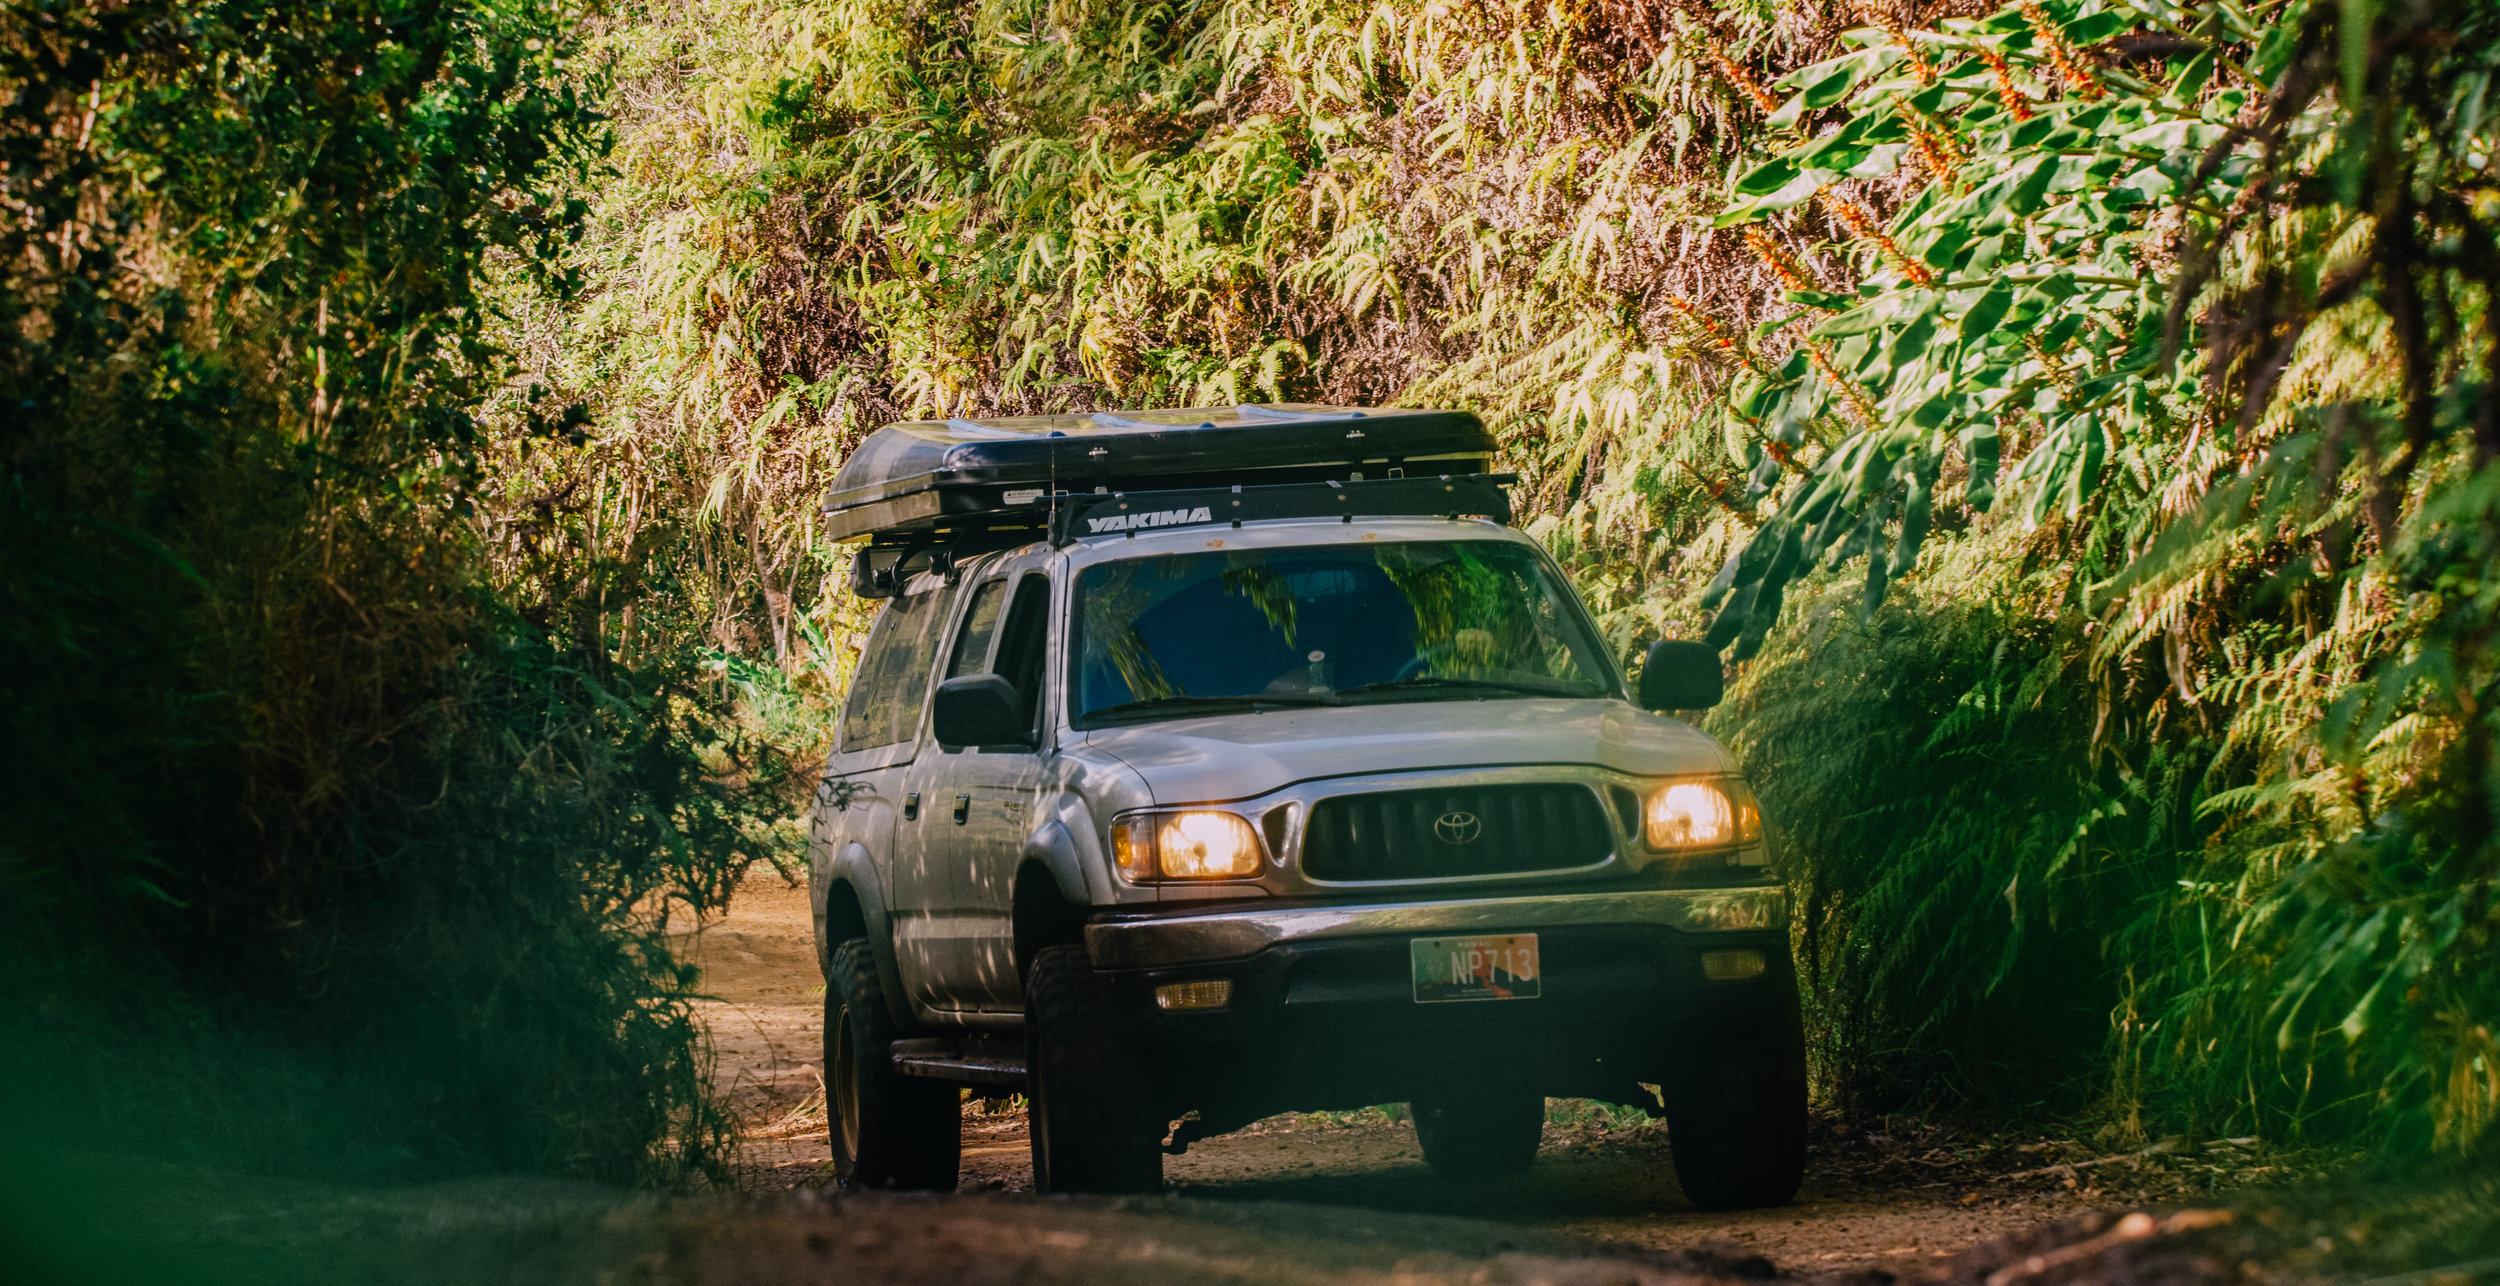 kauai-camping-occean-beach-polihale-kauai roof top campers-3.jpg